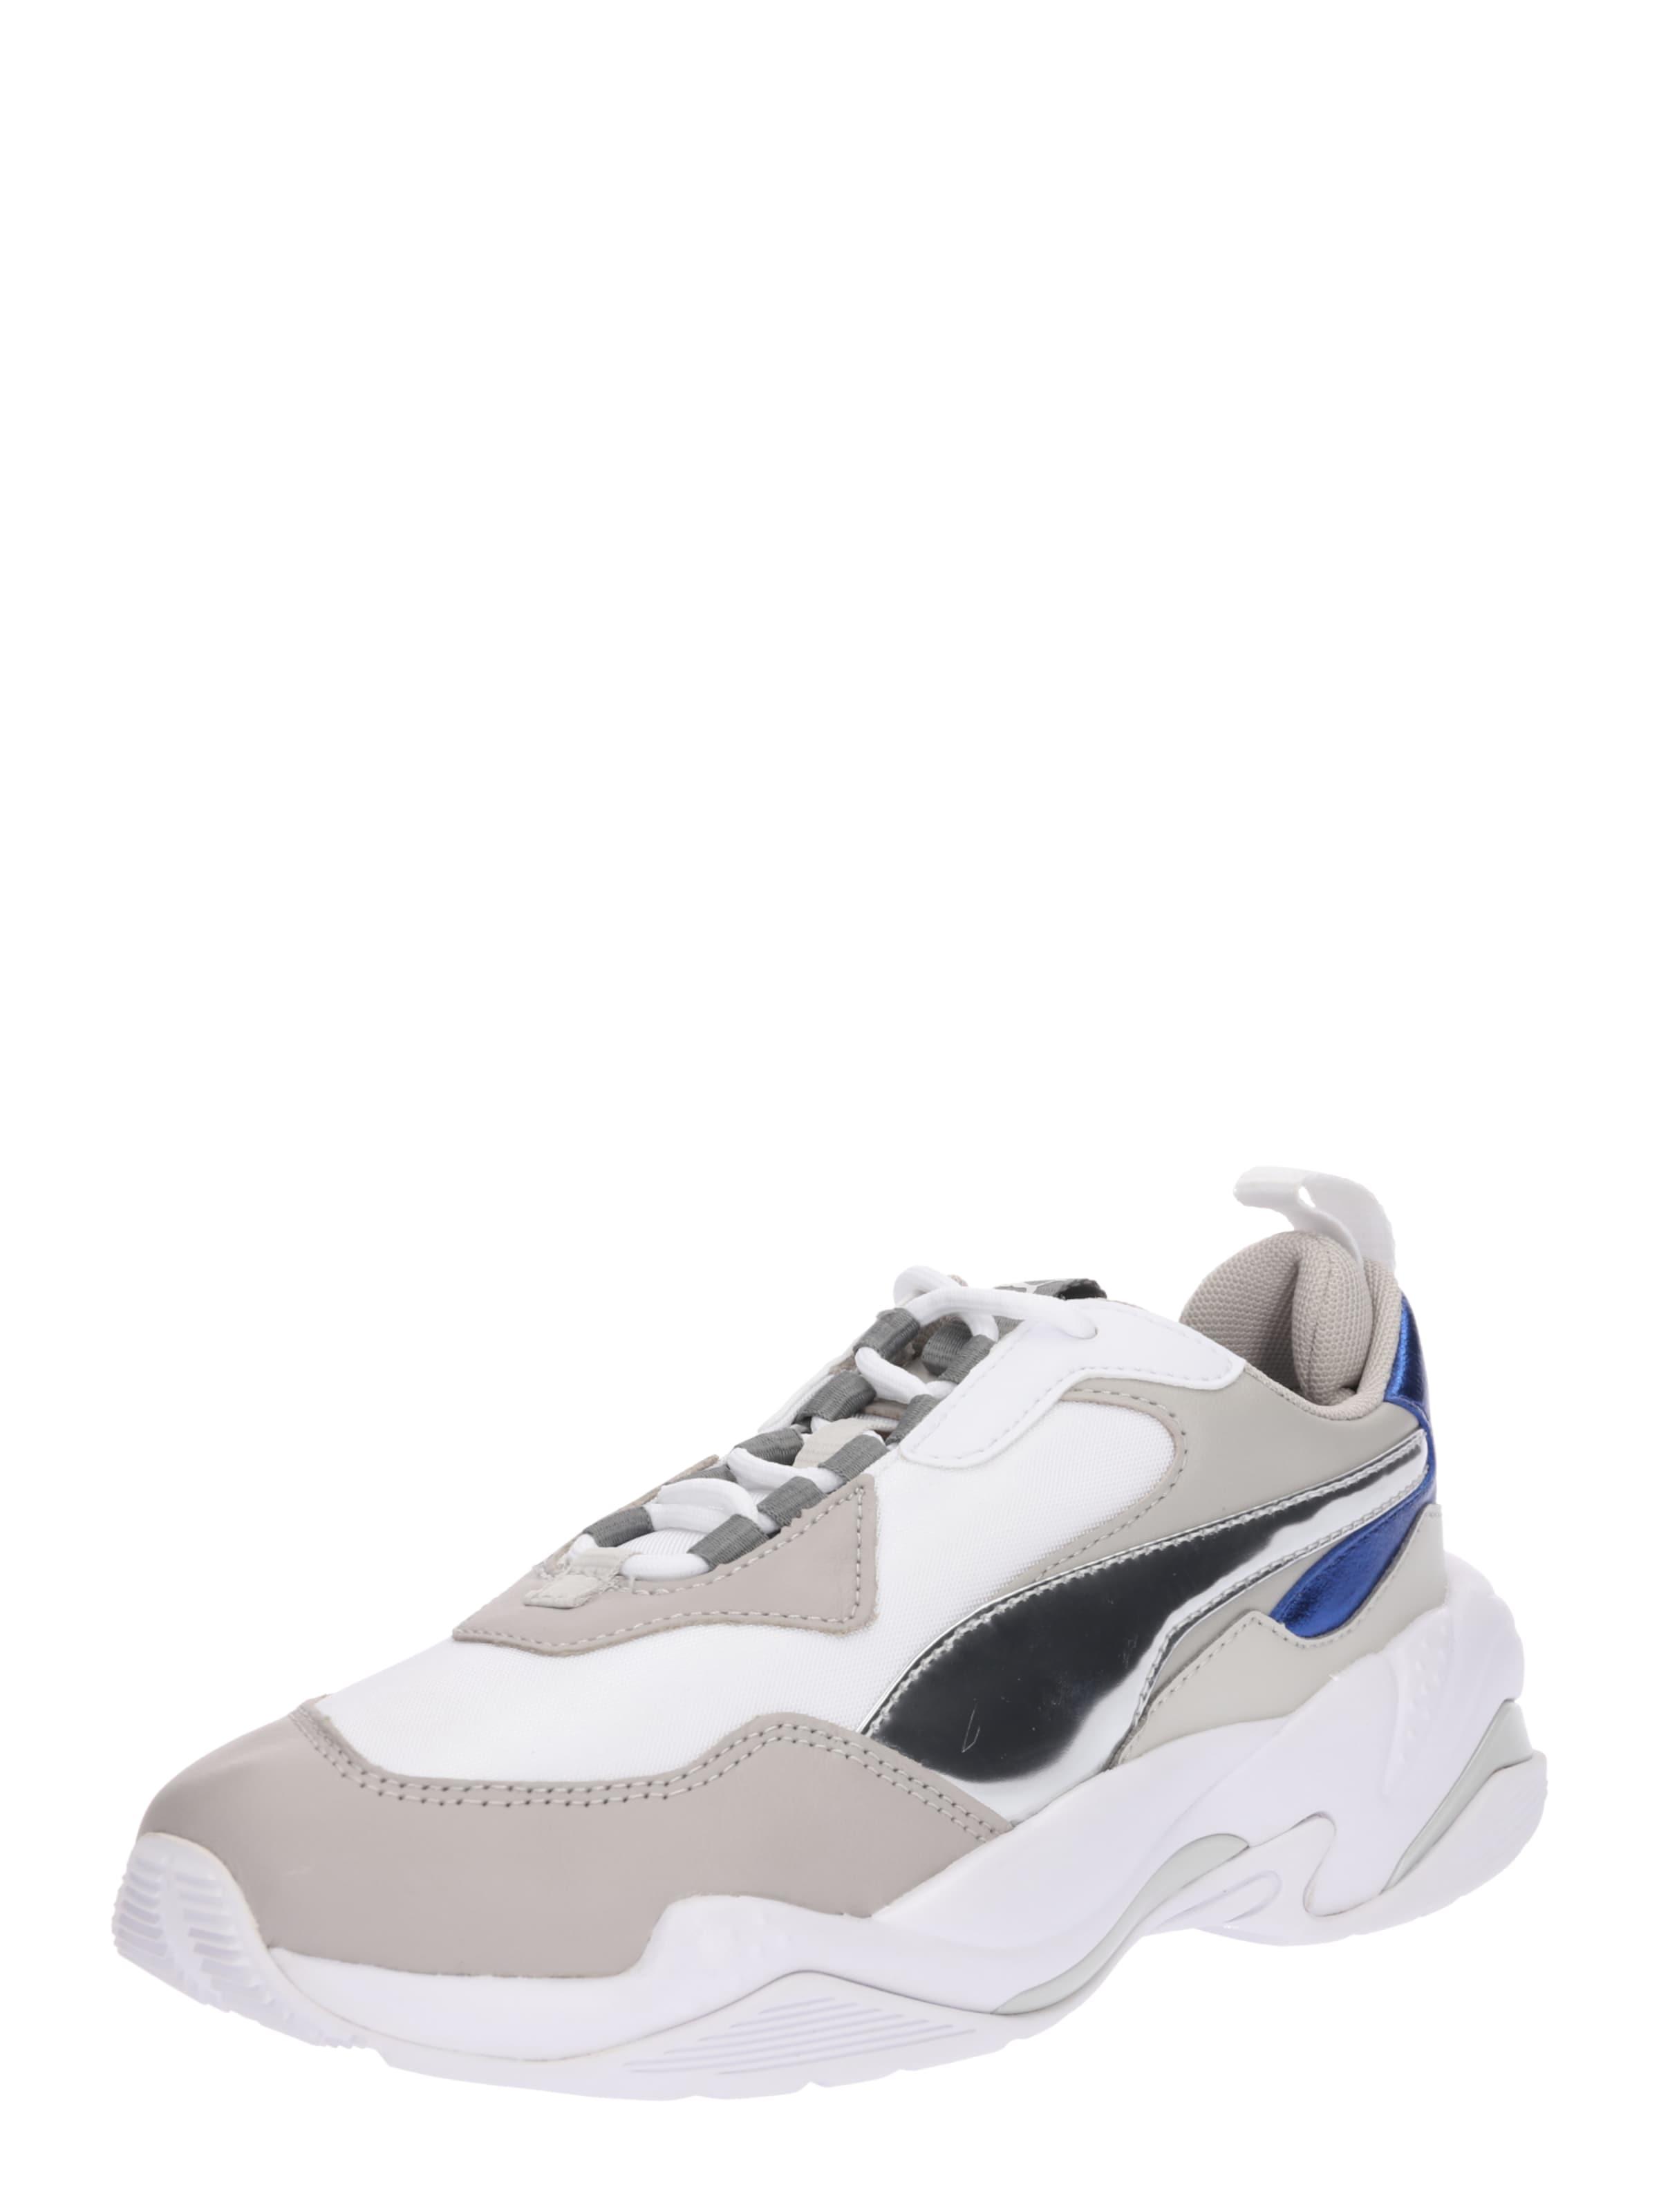 PUMA Sneaker Low Thunder Electric Hohe Qualität